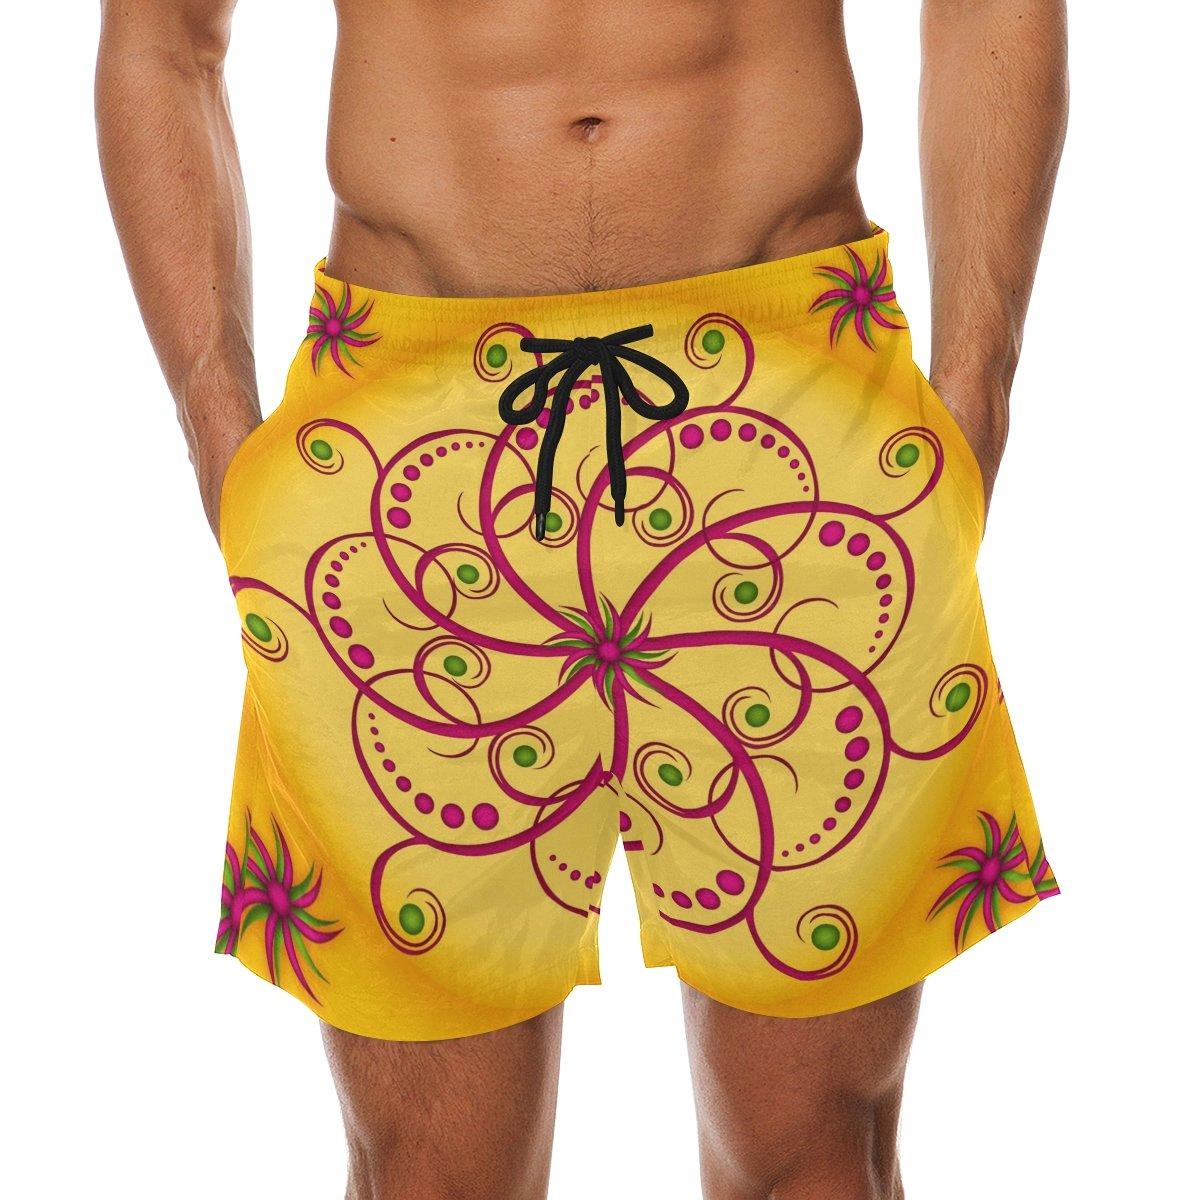 LORVIES Mens Mandala Beach Board Shorts Quick Dry Swim Trunk